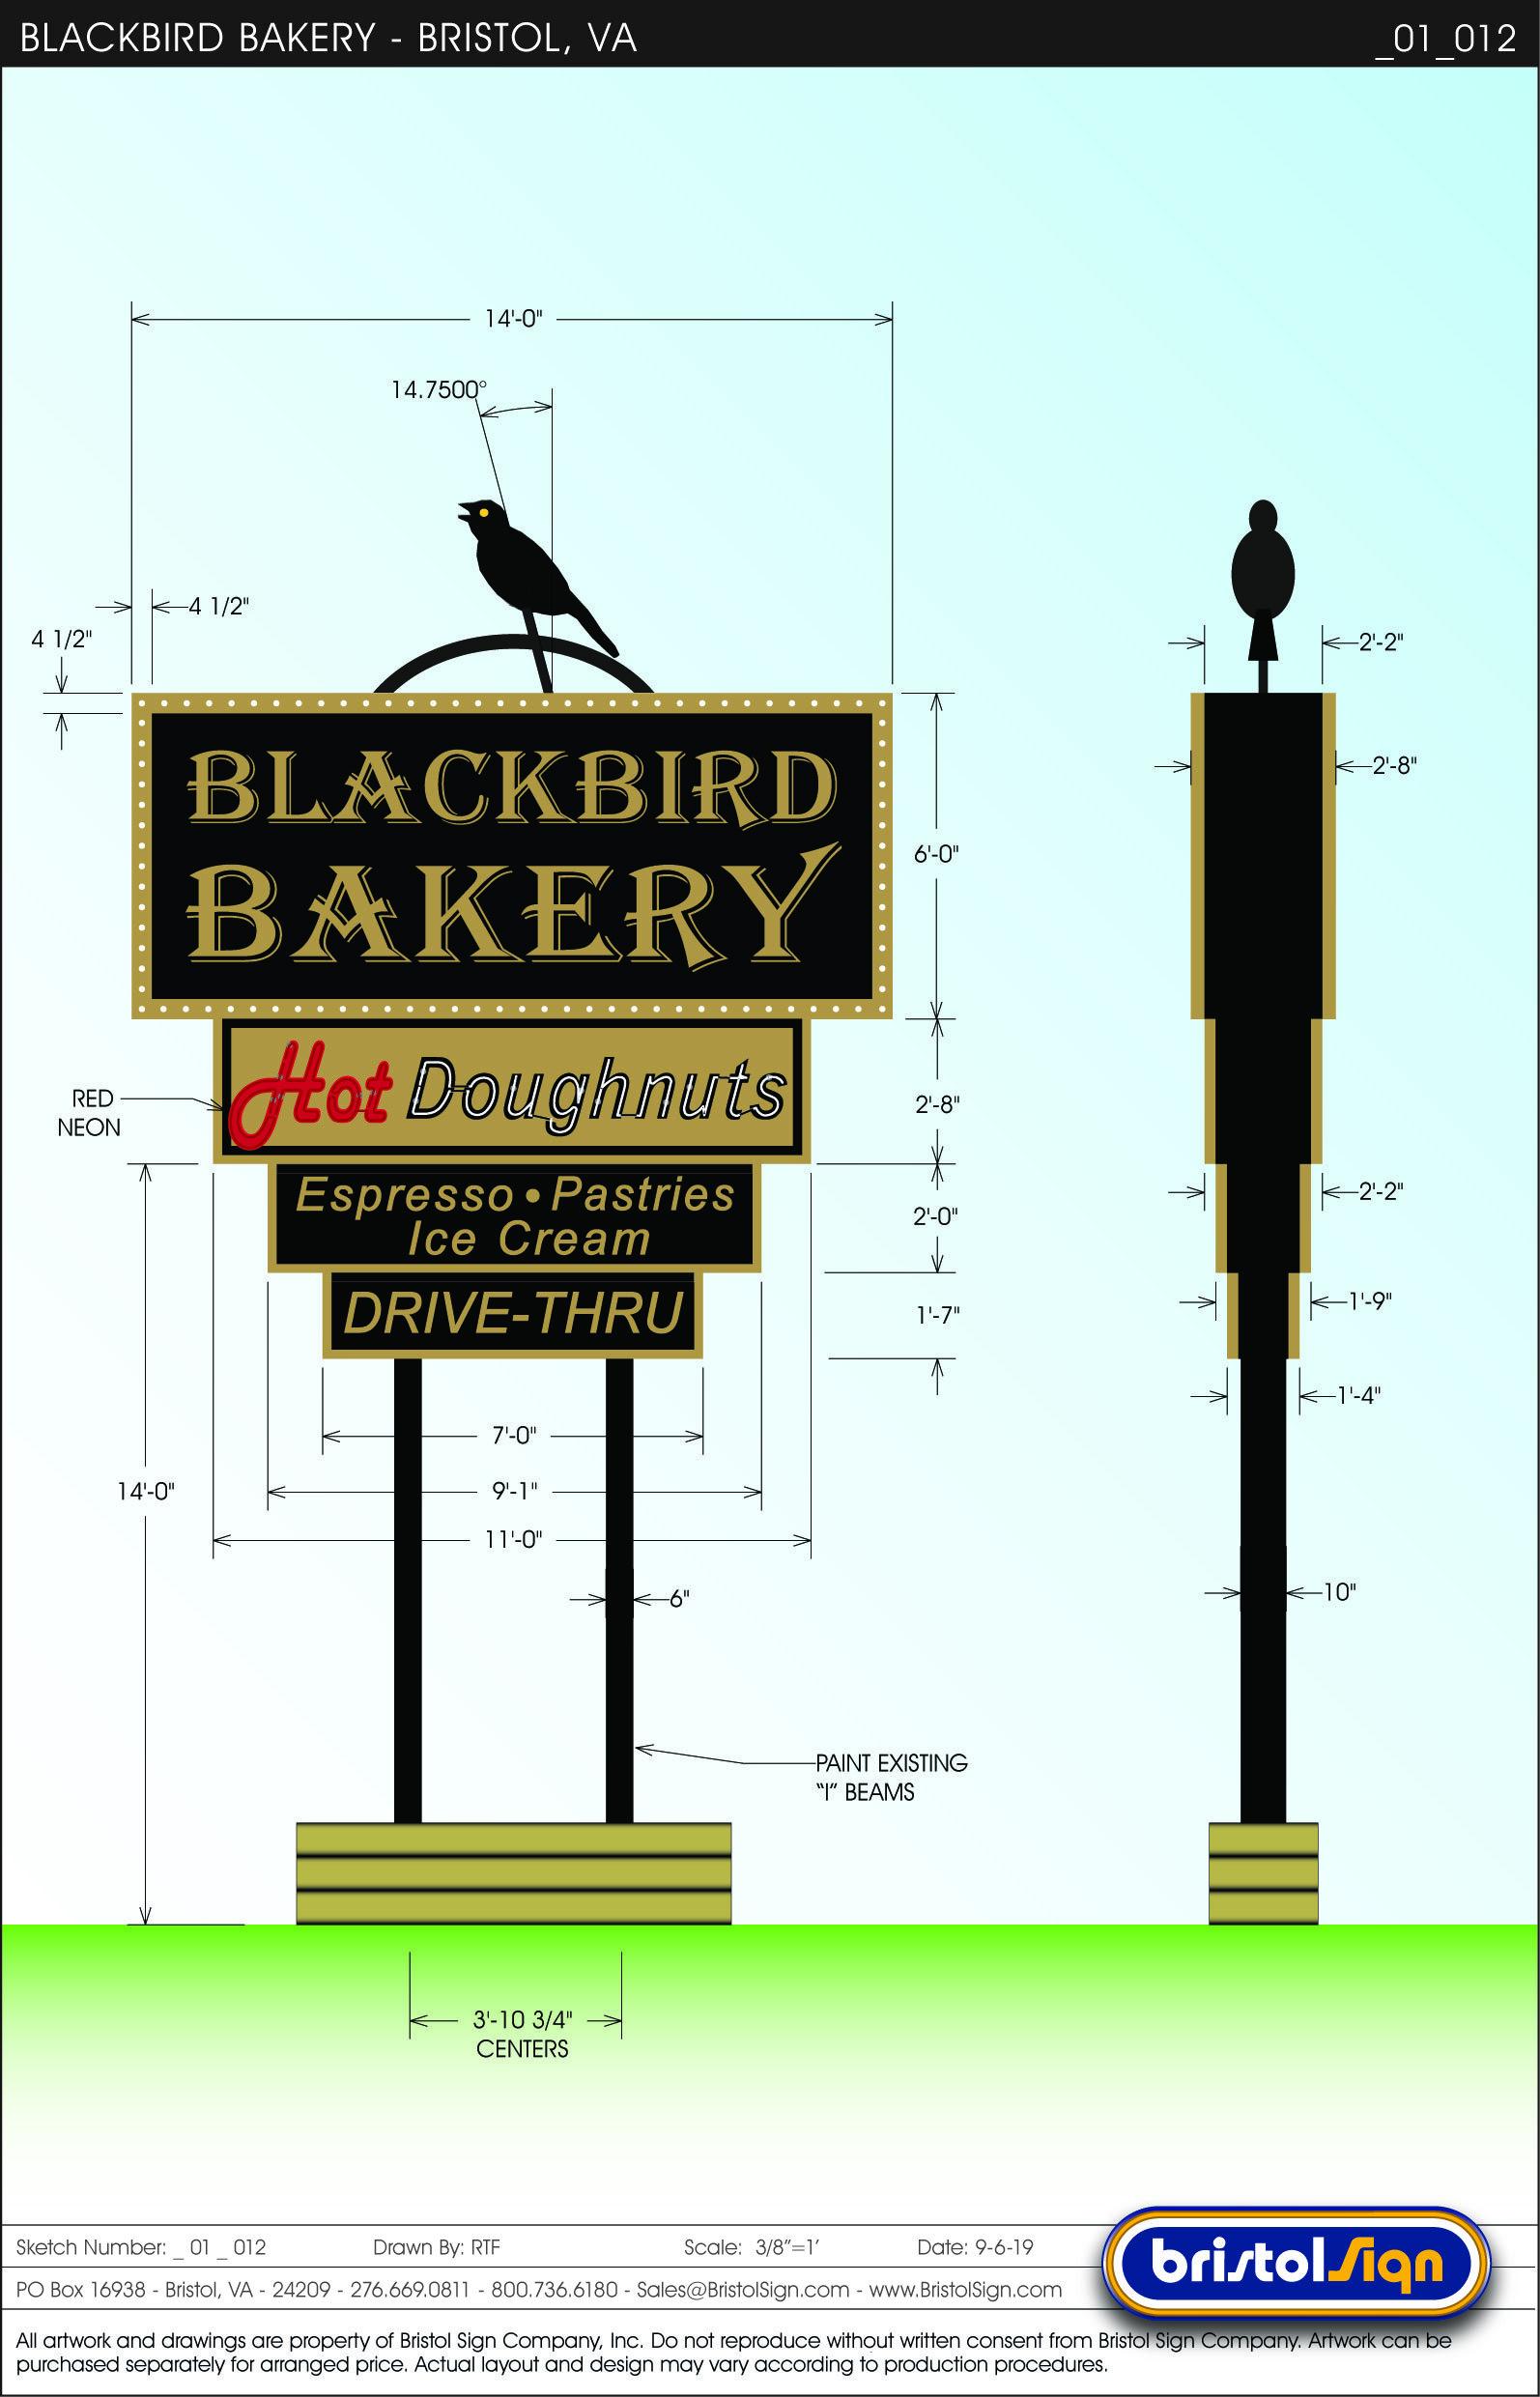 21736 Blackbird Bakery_01_012.jpg